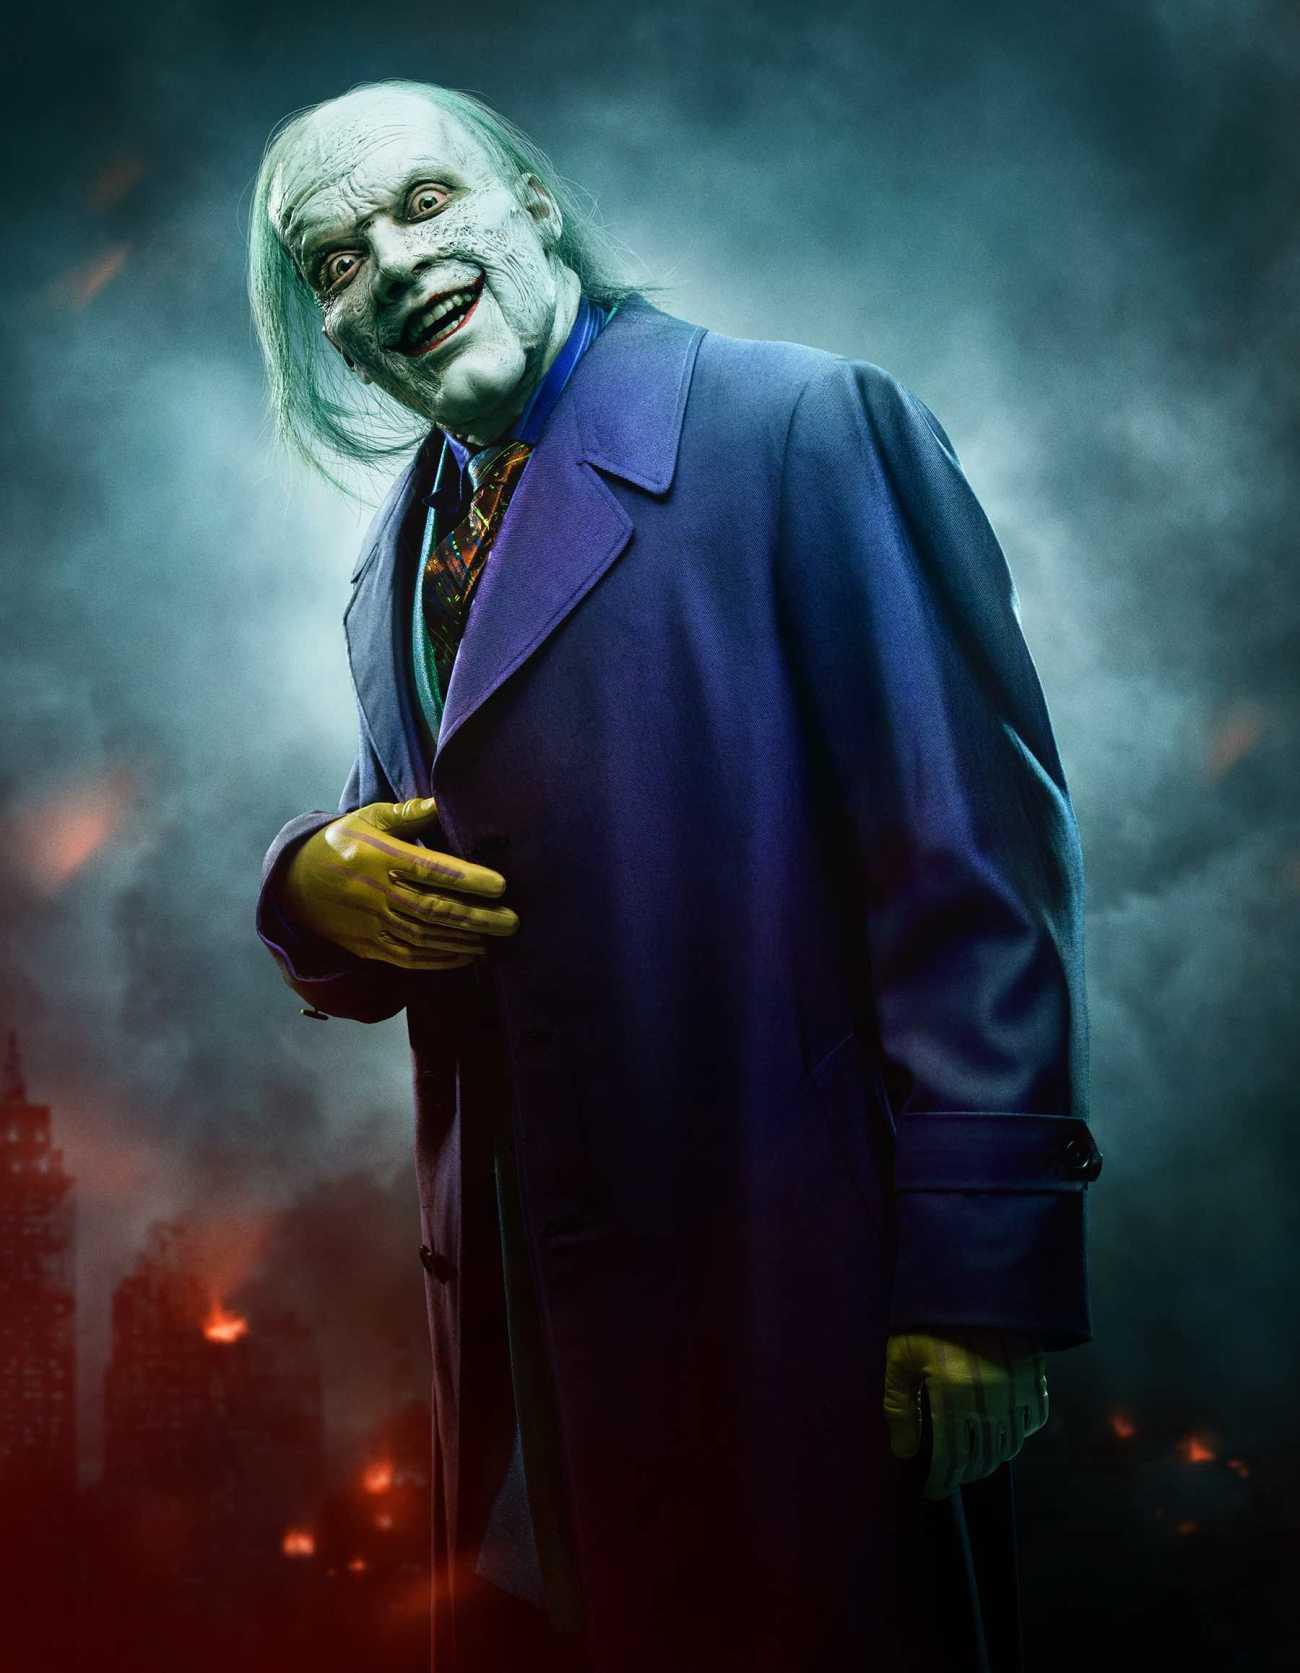 The Joker (Cameron Monaghan) en la temporada 5 de Gotham. Imagen: Entertainment Weekly/FOX